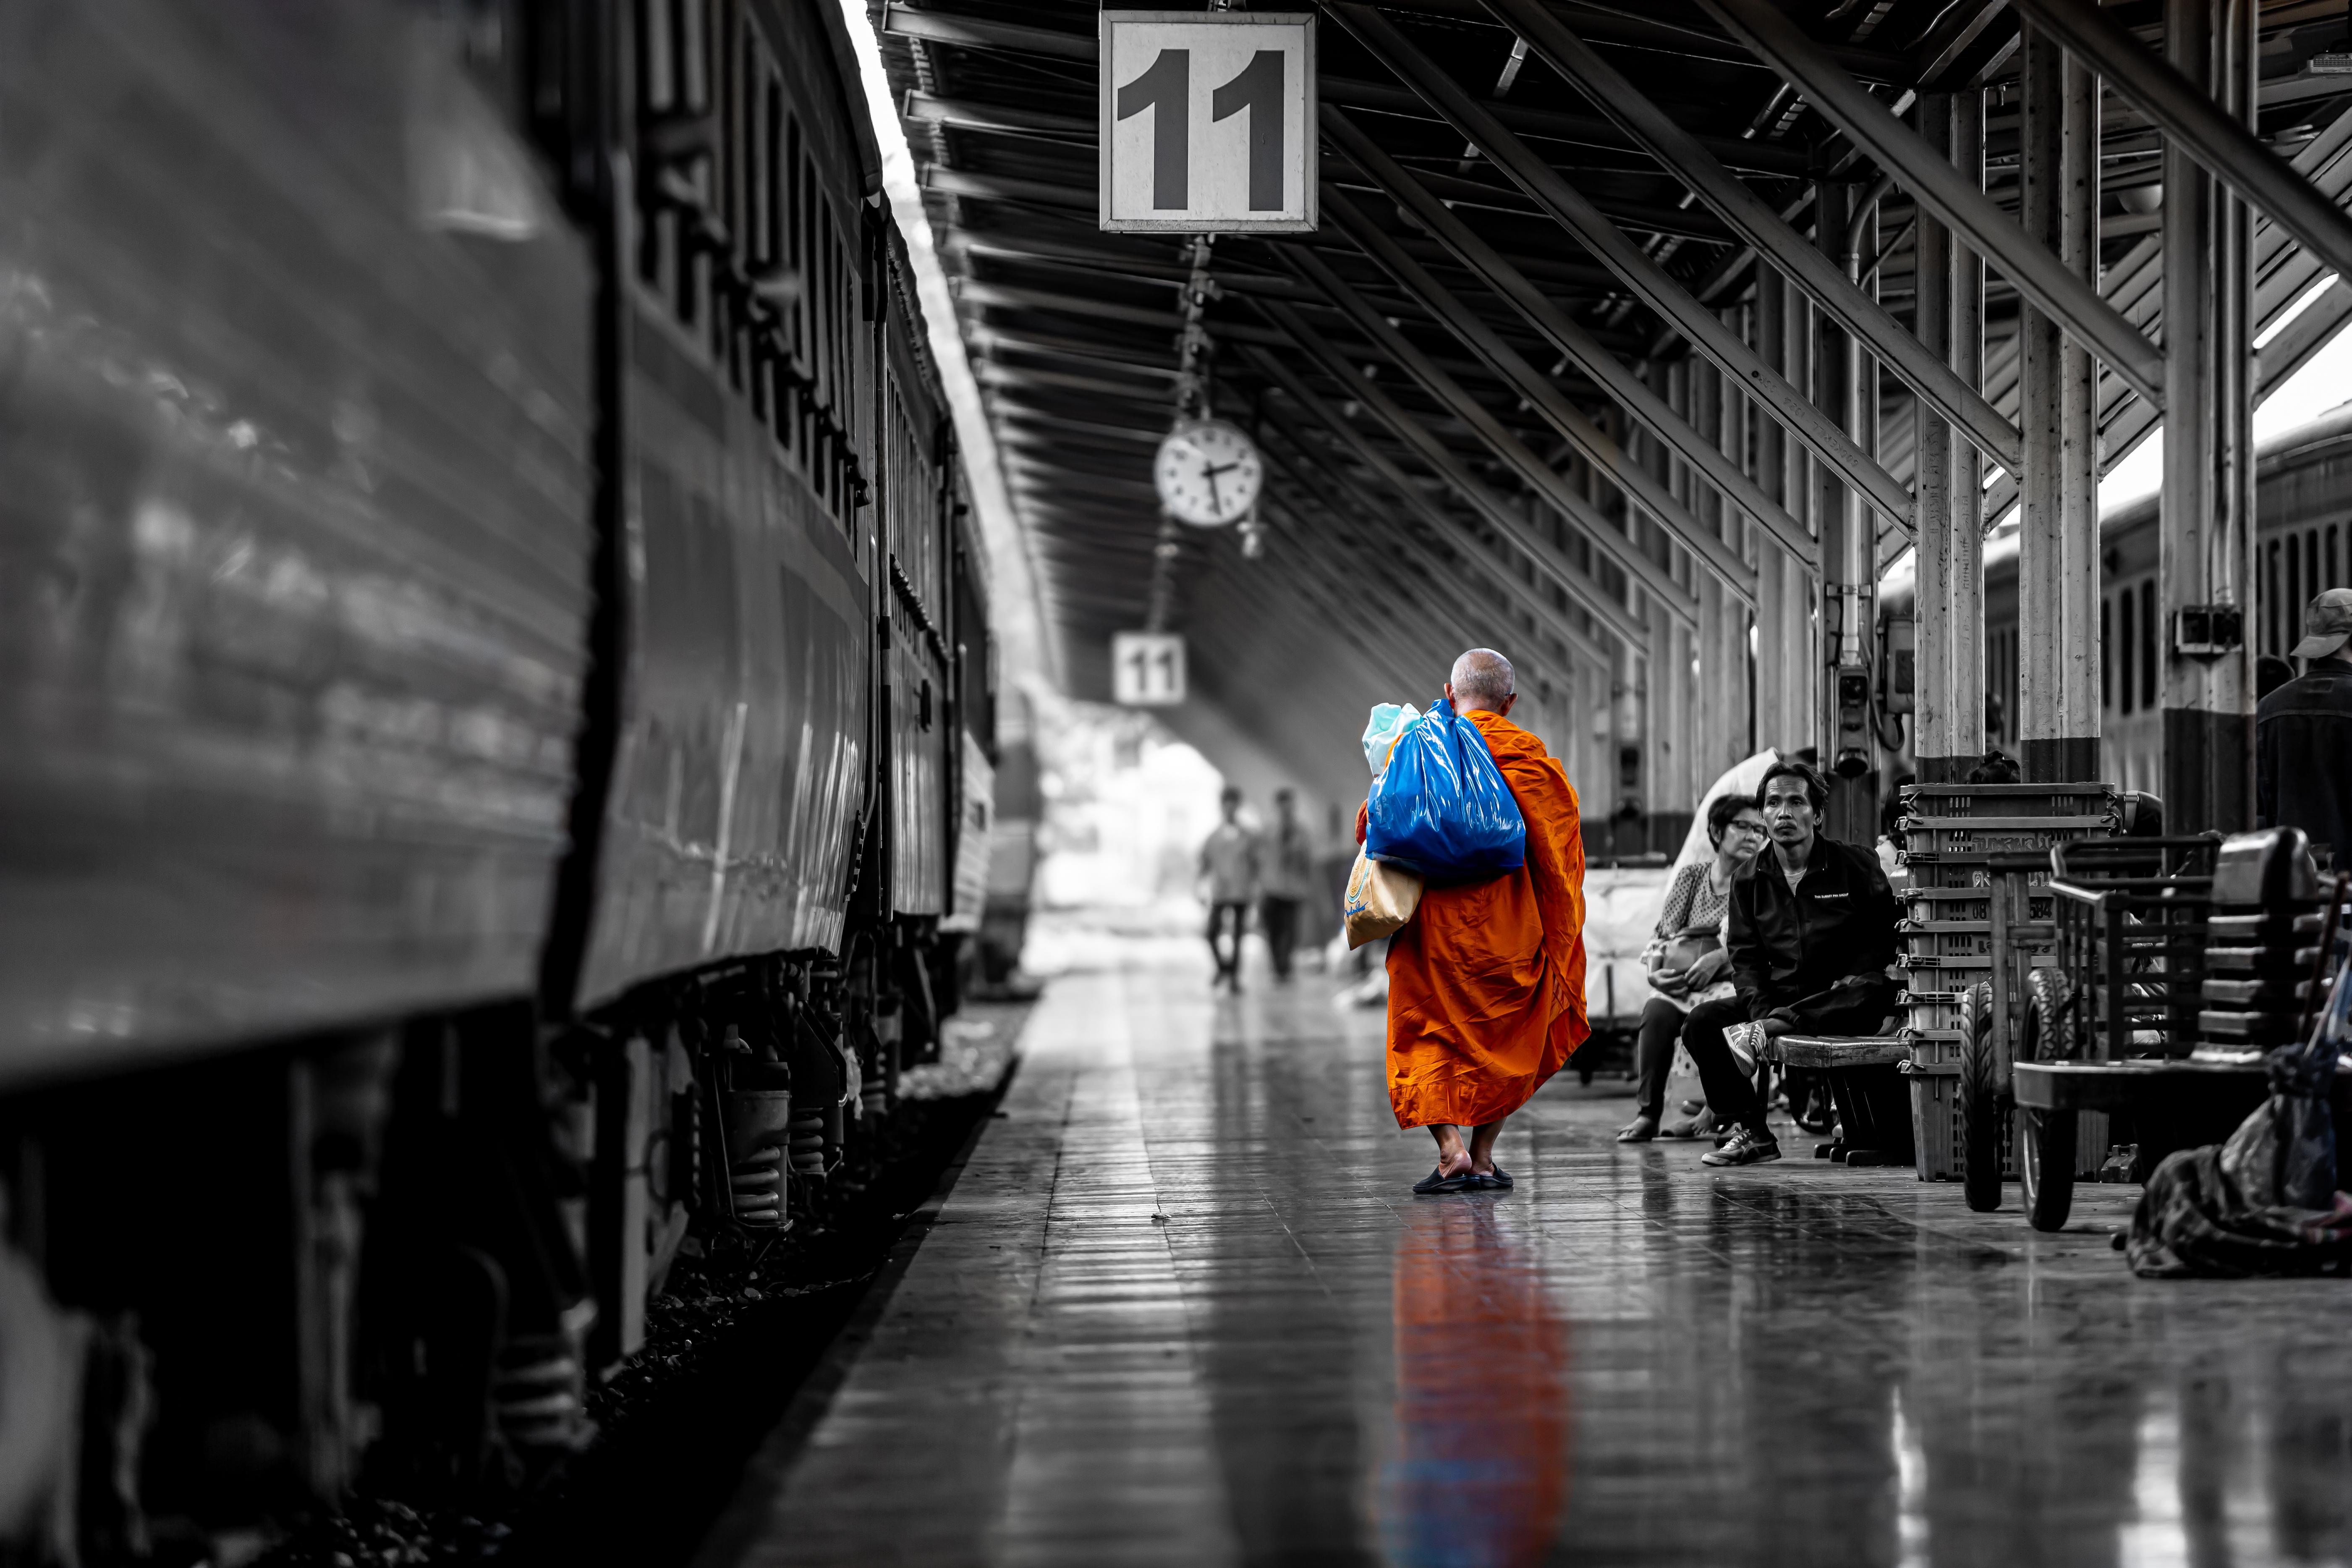 """2:28pm, Platform 11"""